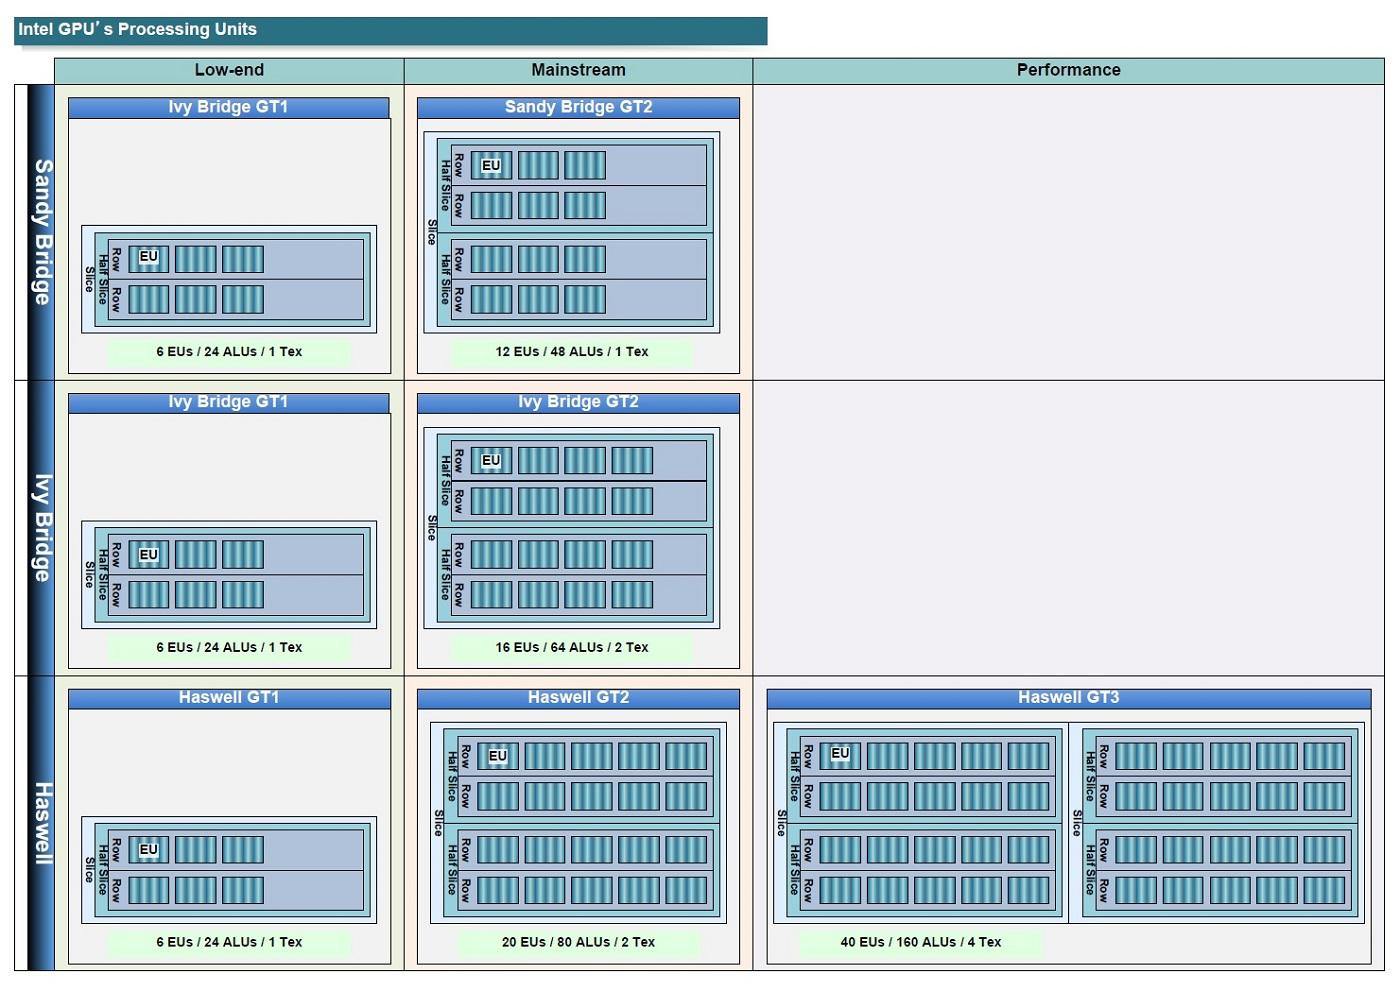 "Intelプロセッサ内蔵グラフィックス移行図(PDF版は<span class=""img-inline raw""><a href=""/video/pcw/docs/598/286/p08.pdf"" ipw_status=""1"" ipw_linktype=""filelink_raw"" class=""resource"">こちら</a></span>)"